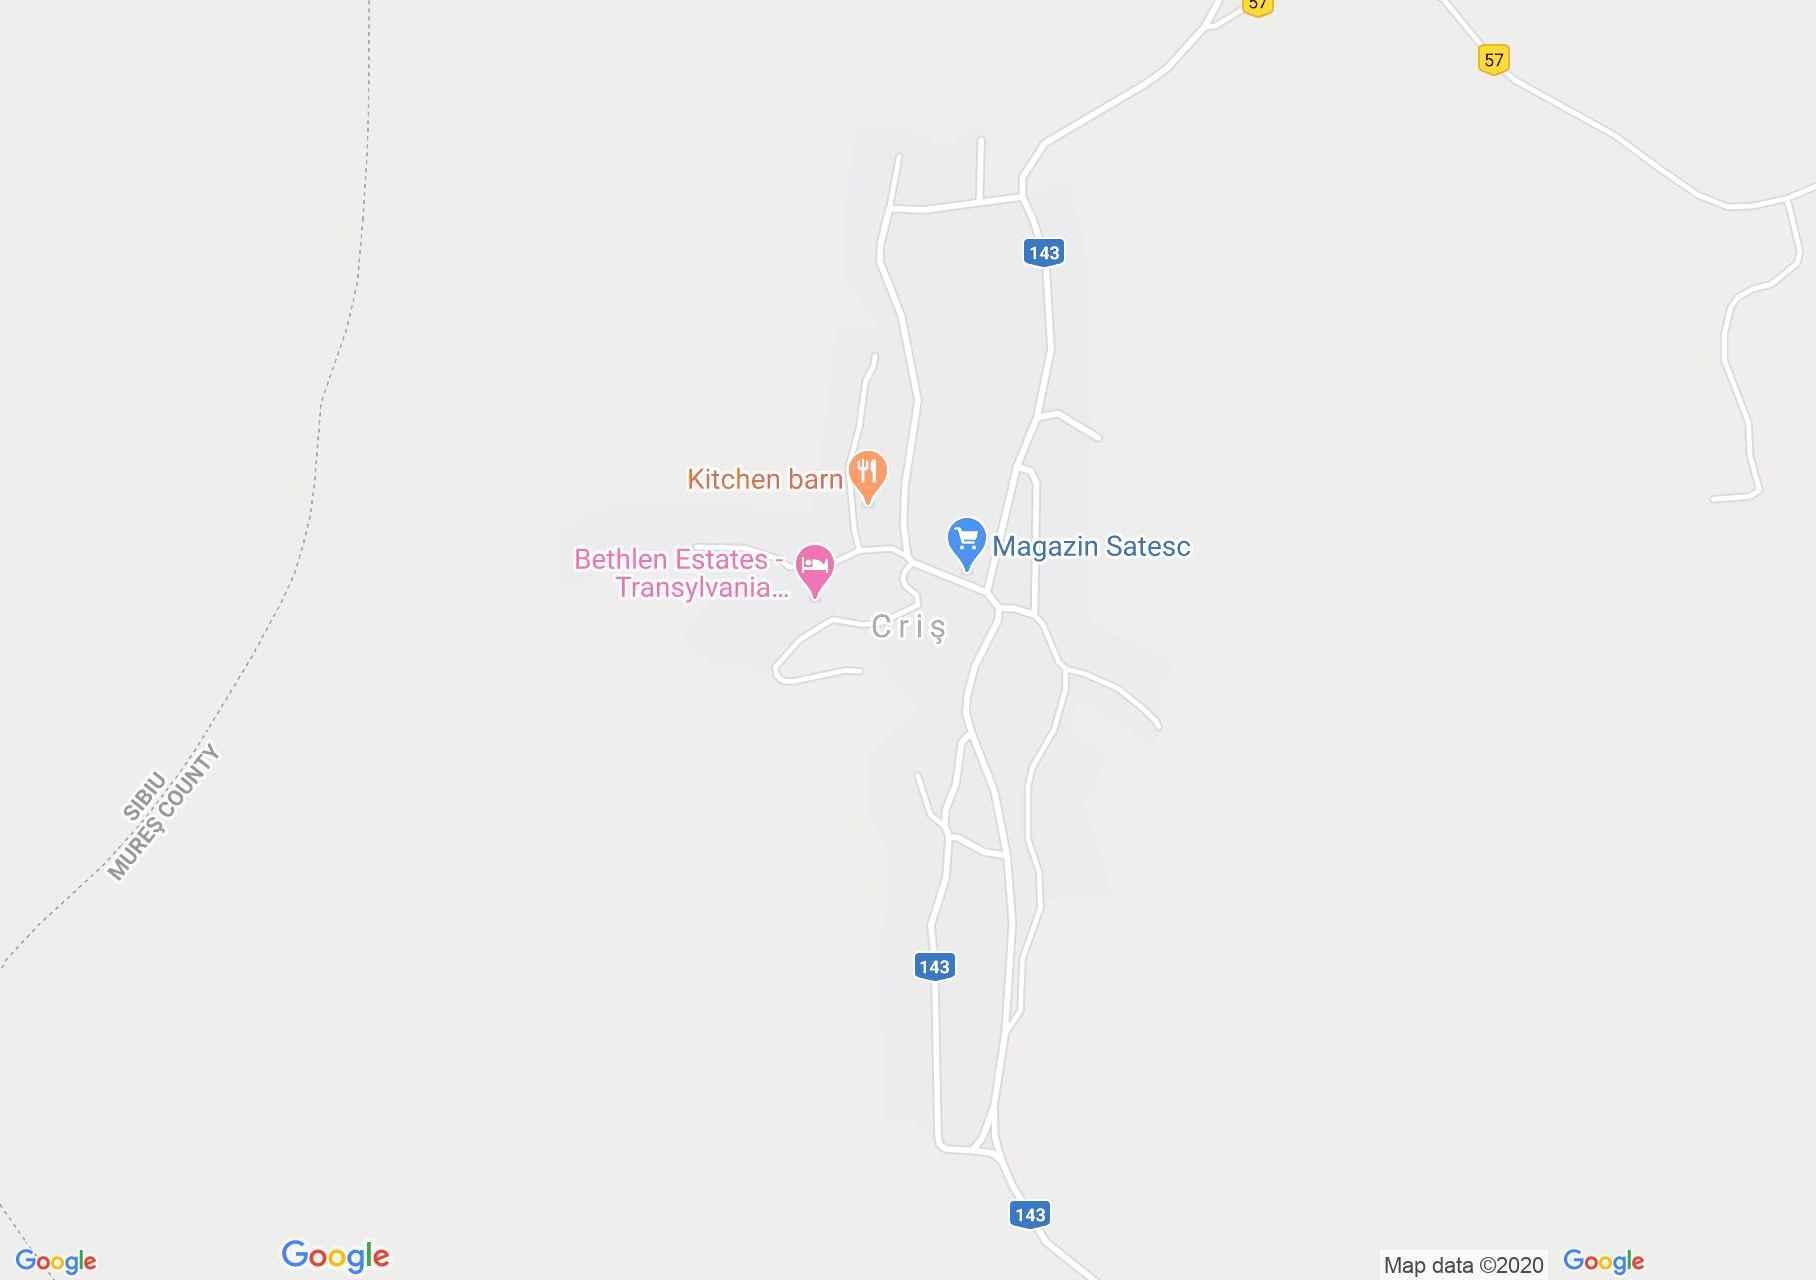 Criş, Interactive tourist map